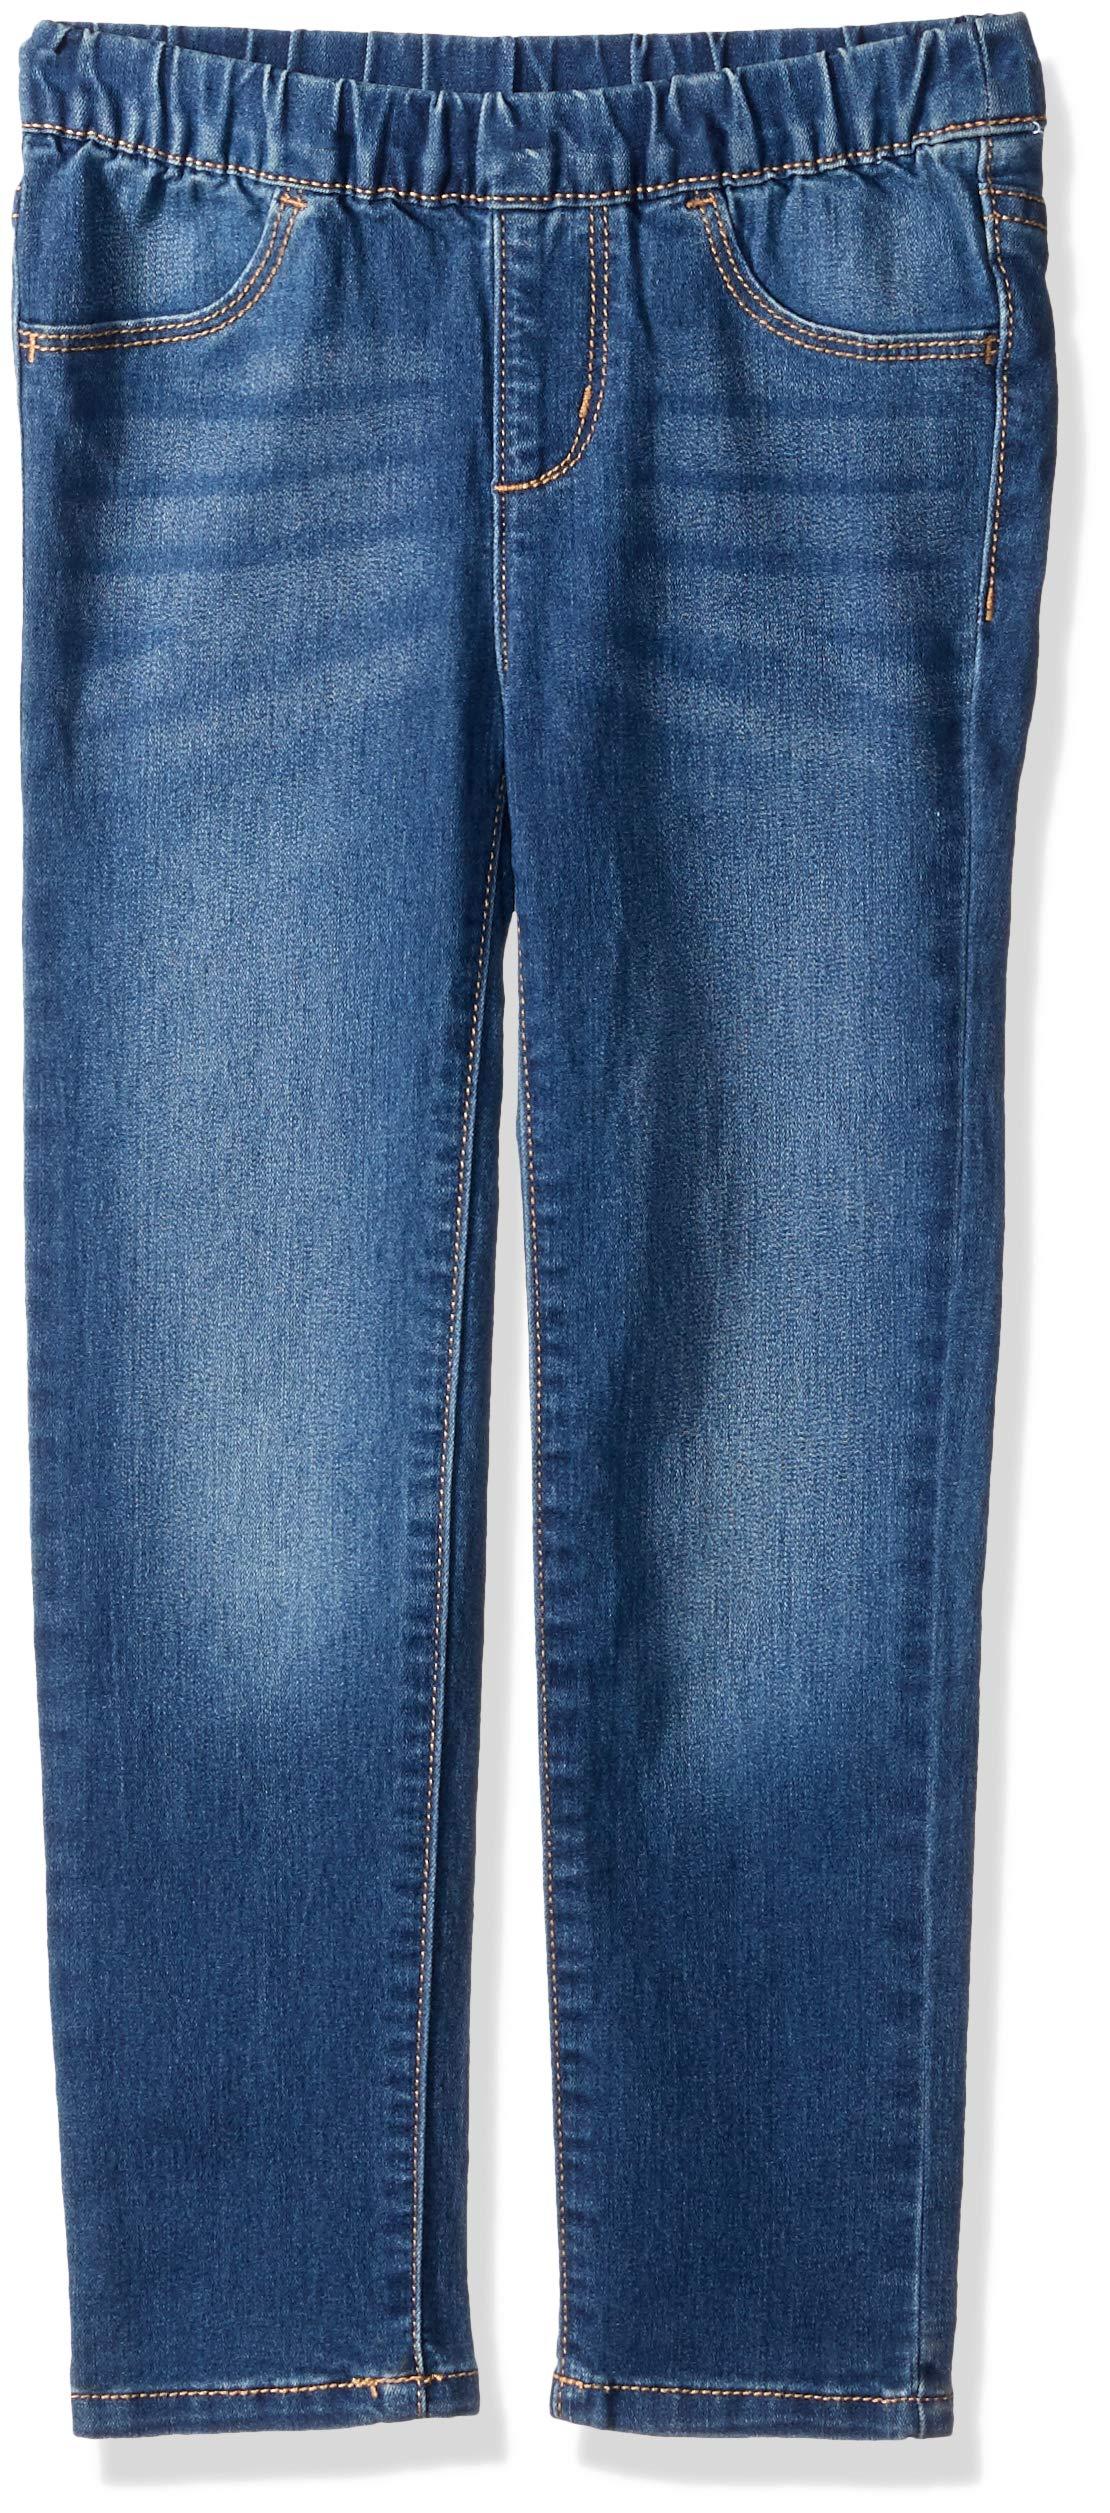 Crazy 8 Toddler Girls' Basic Jegging Pants, Medium Wash Denim, 5T